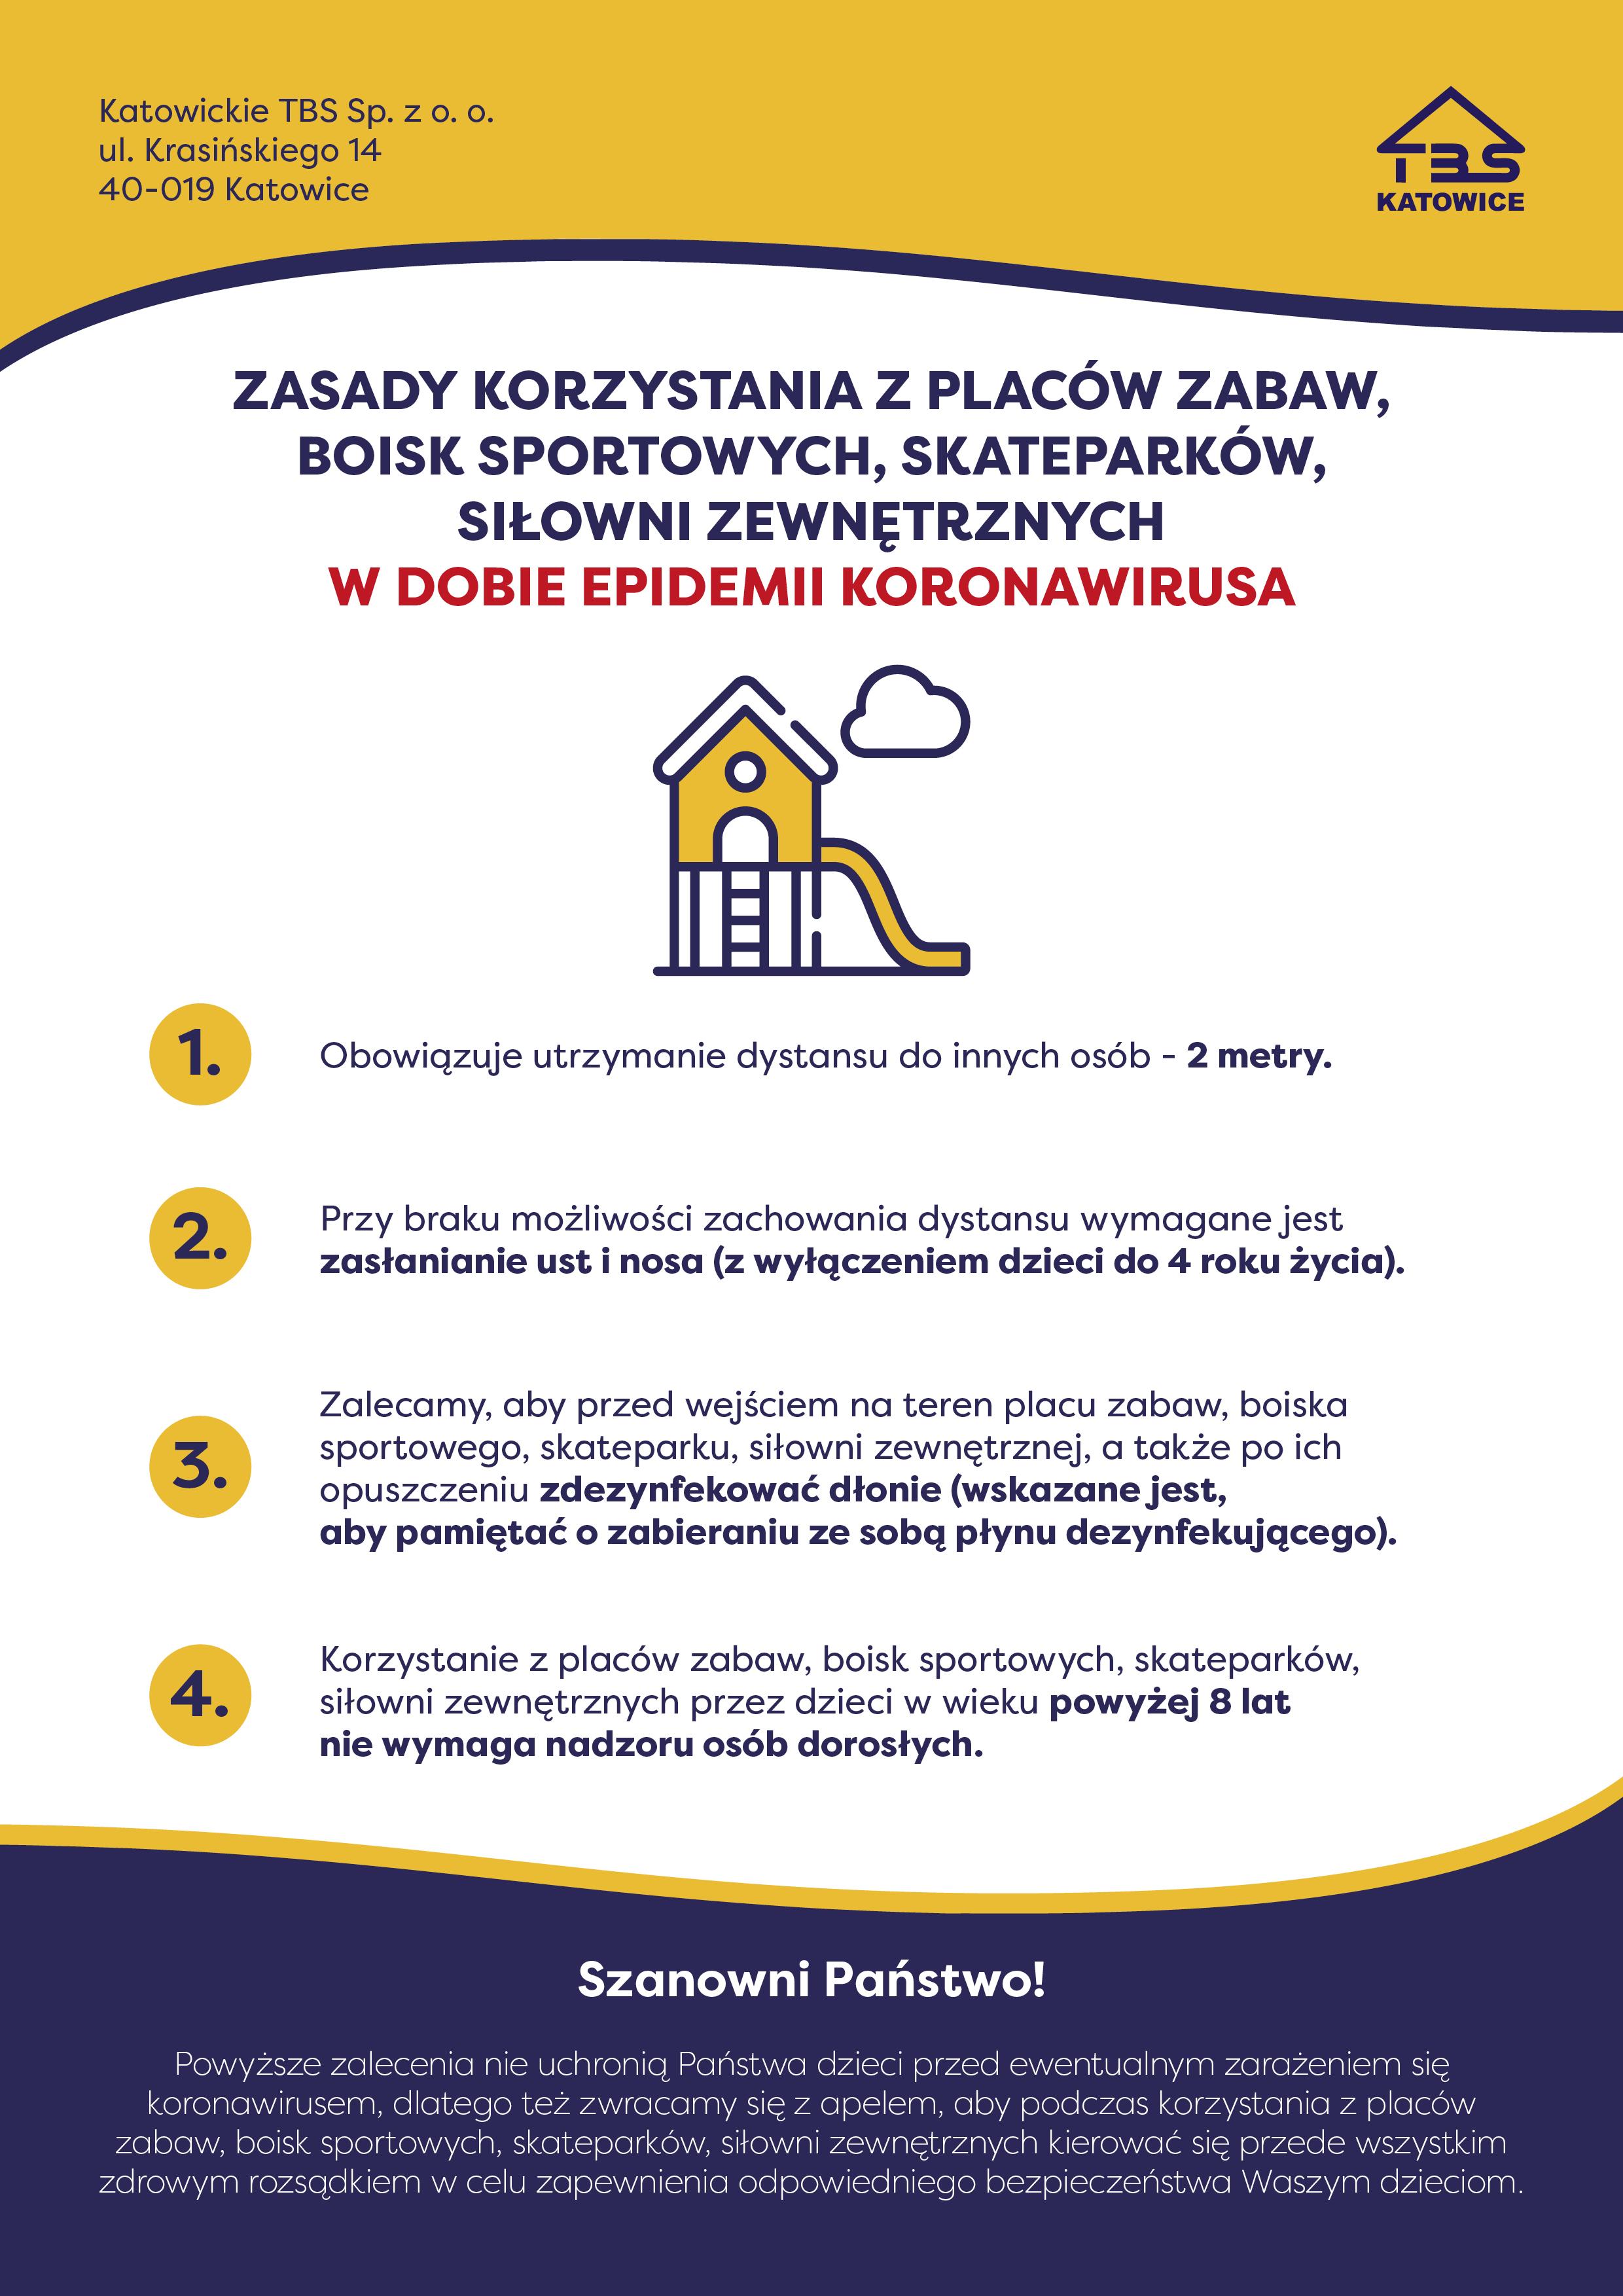 a4-plakat-place-zabaw